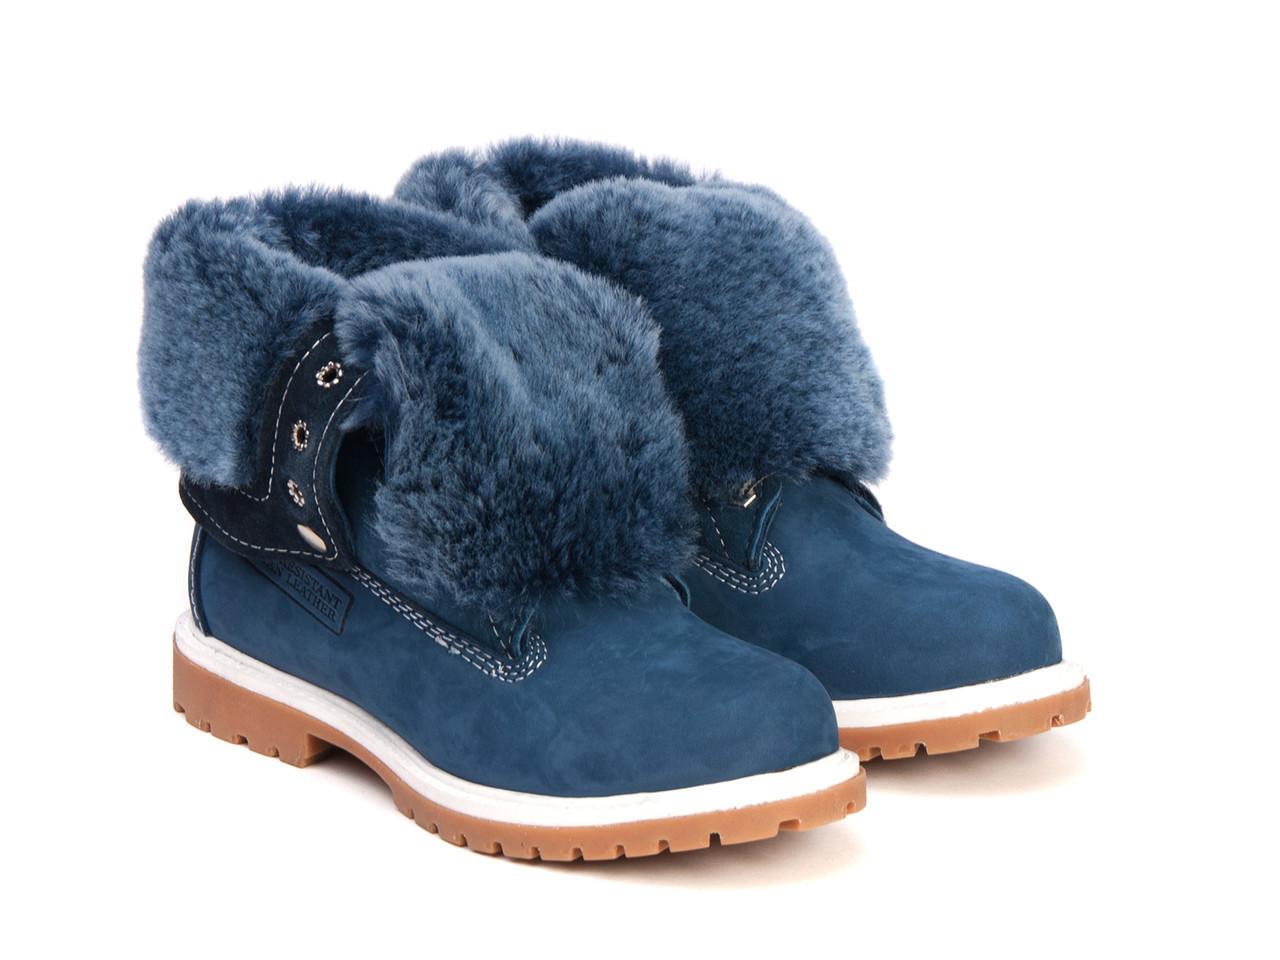 Ботинки Etor 10315-2298-734 40 синие